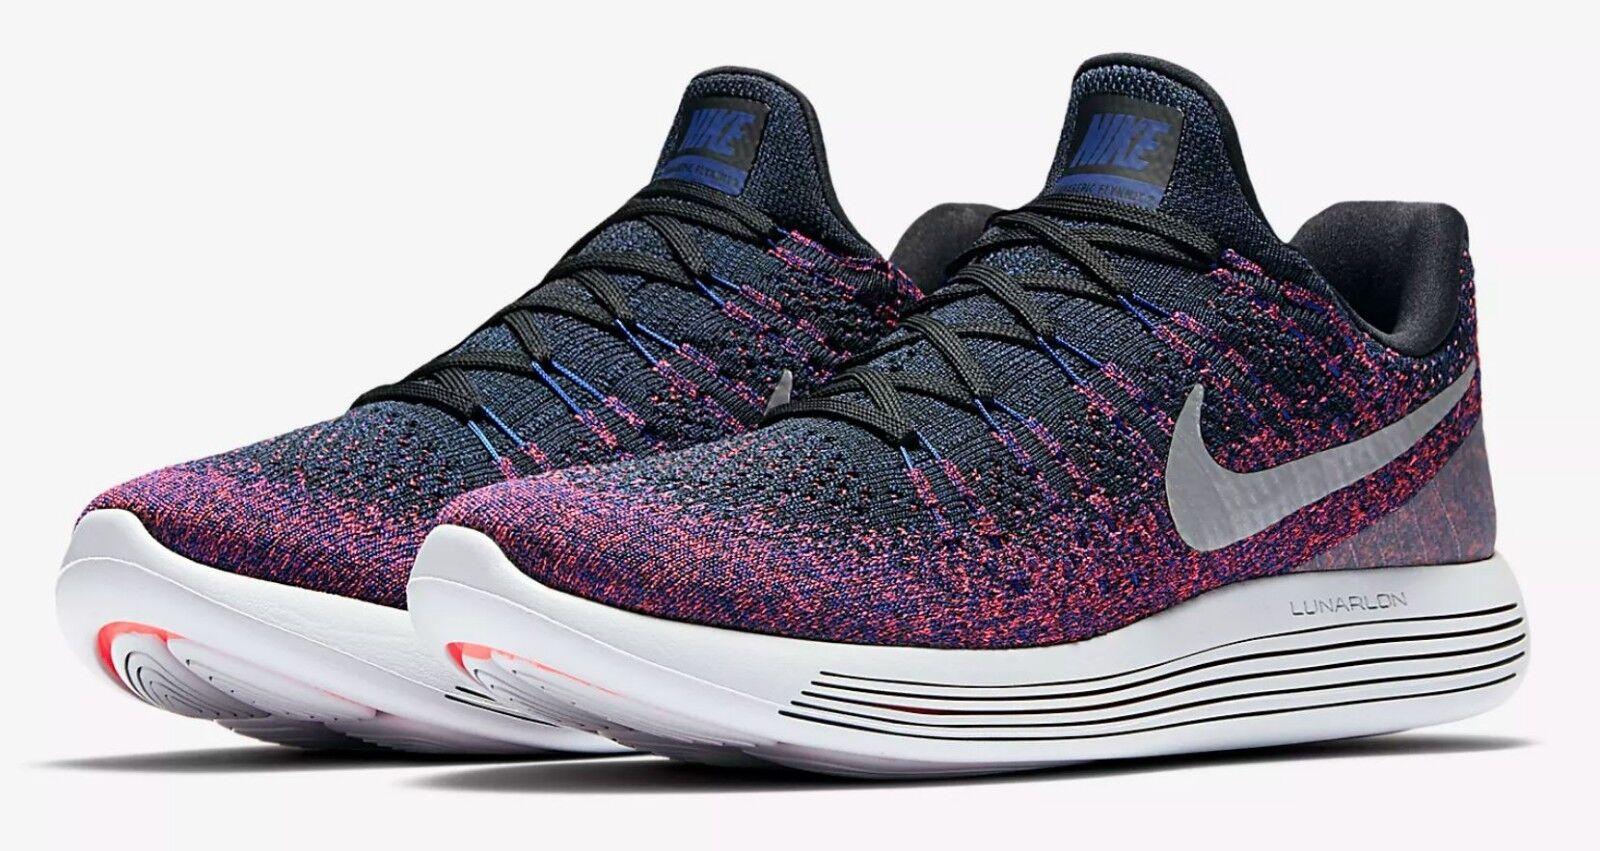 Nike Men's Running Shoes LunarEpic Low Flyknit 2 Black Punch Sz 10.5 863779-015